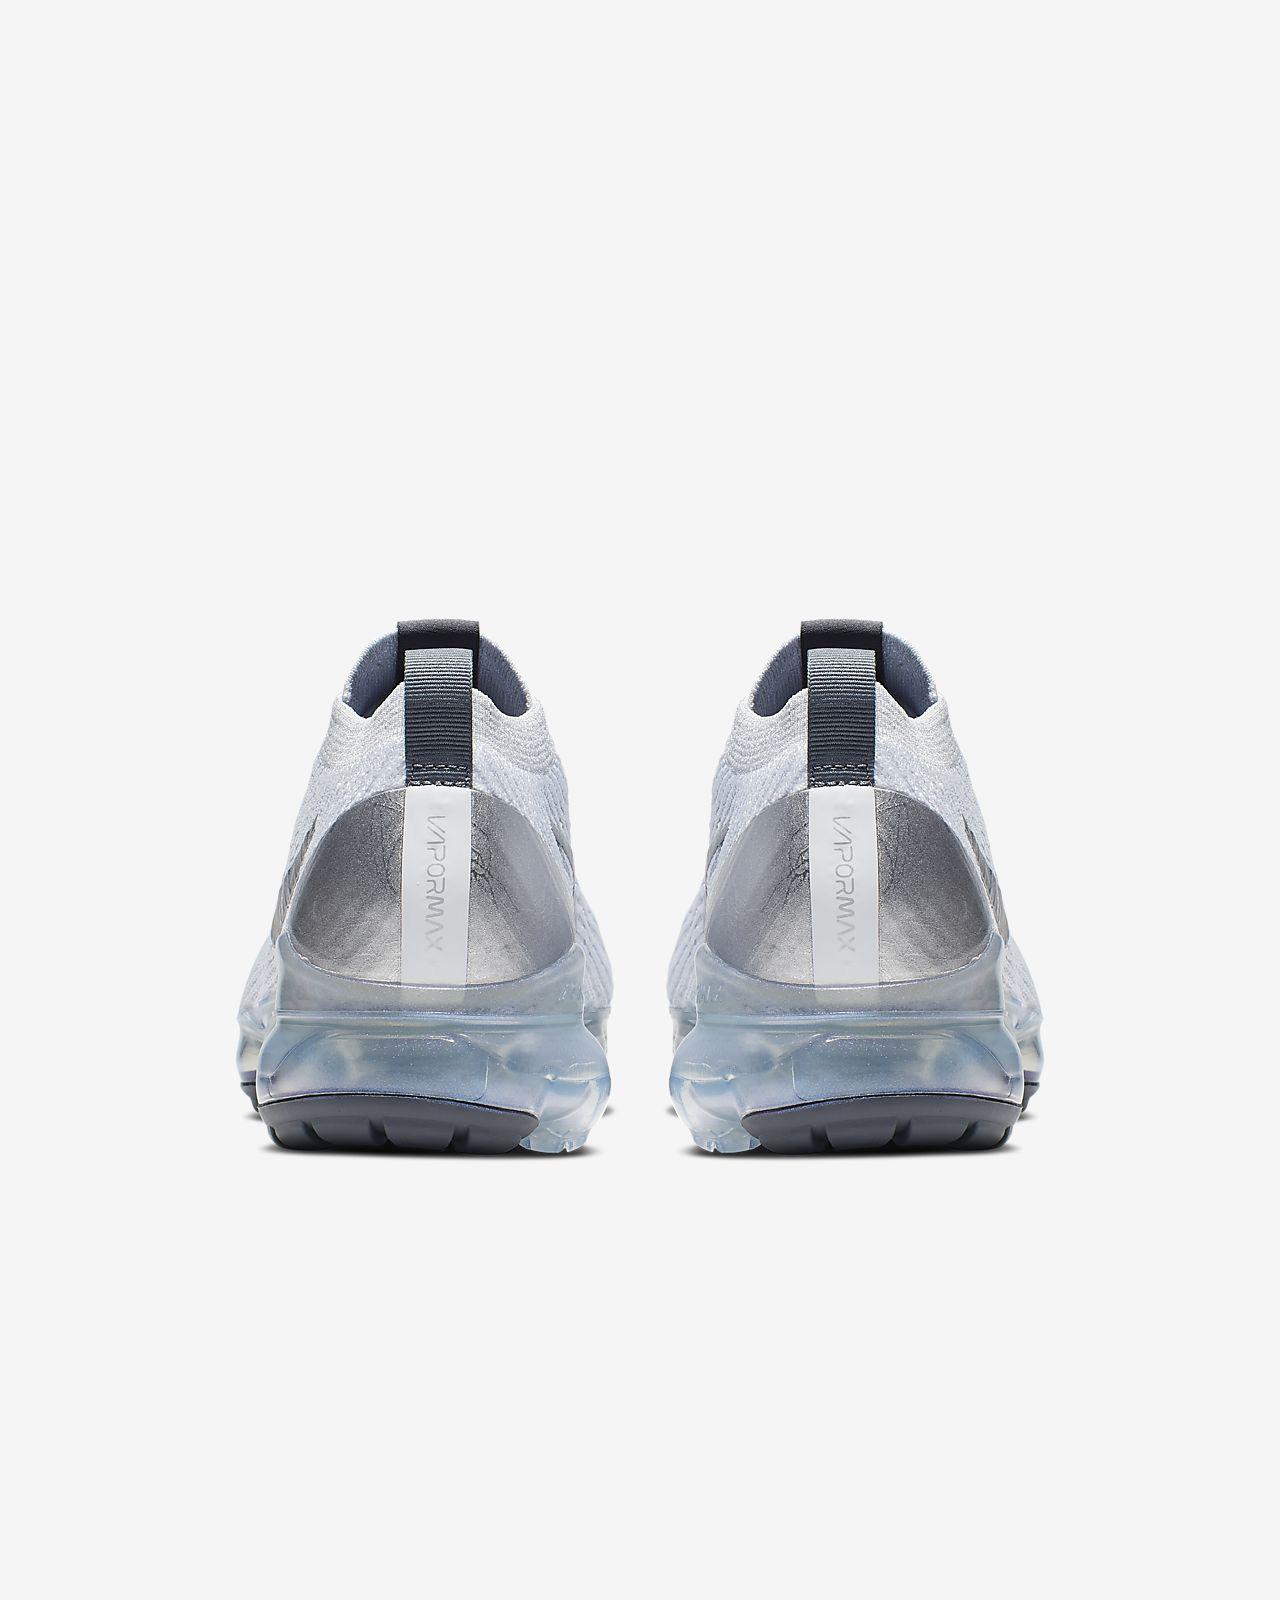 innovative design 80115 0ec24 ... Nike Air VaporMax Flyknit 3 Women s Shoe